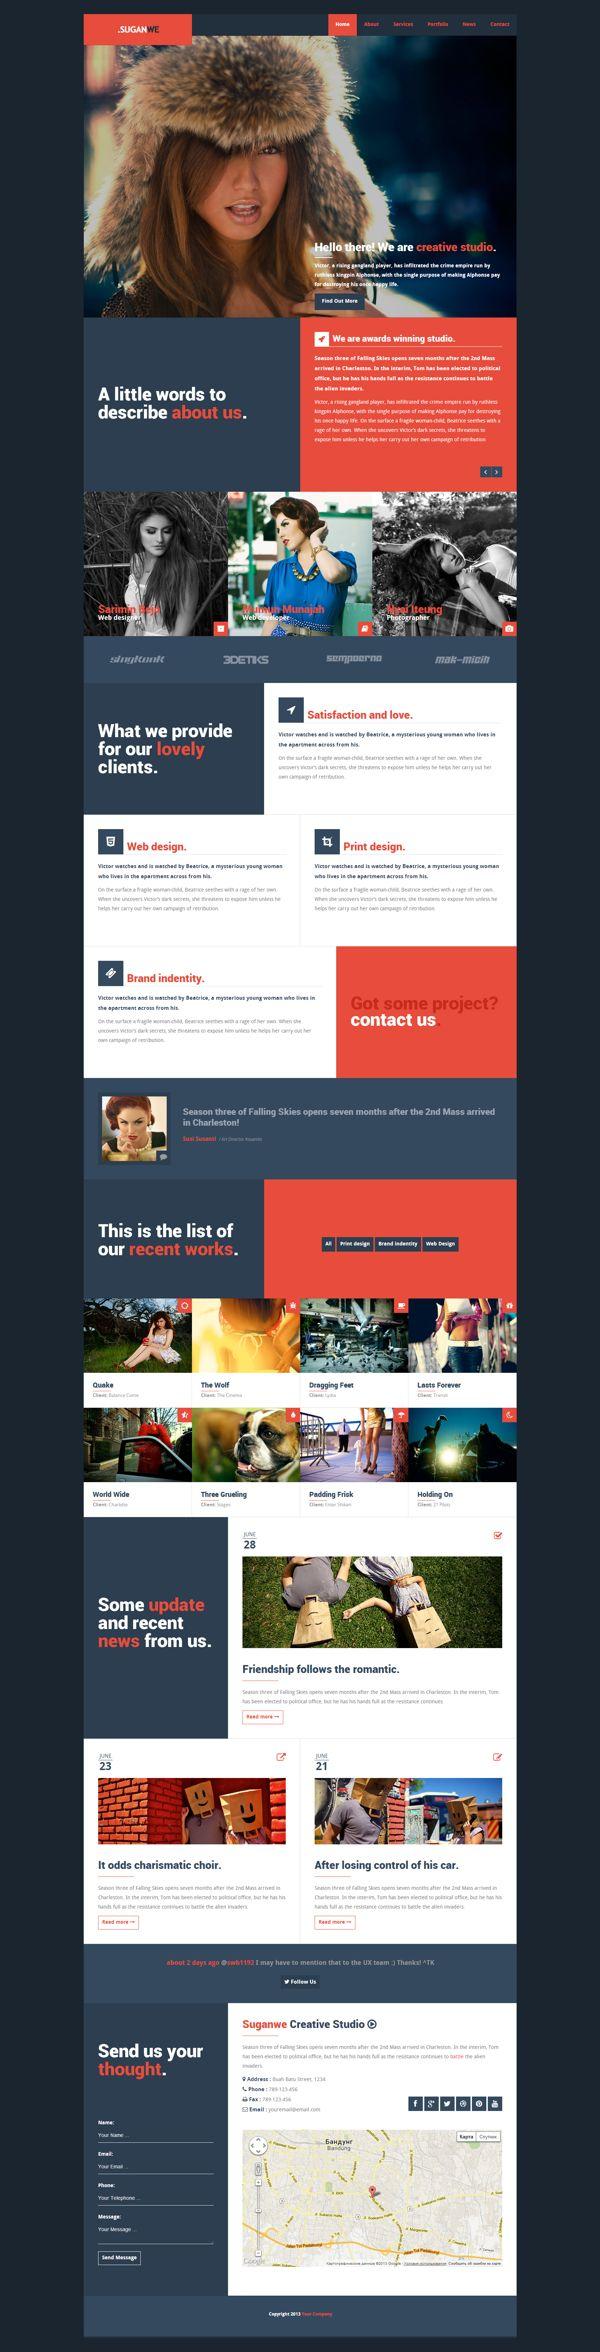 Suganwe - Responsive One Page Template HTML5 by Zizaza & Dezayo Design , via Behance